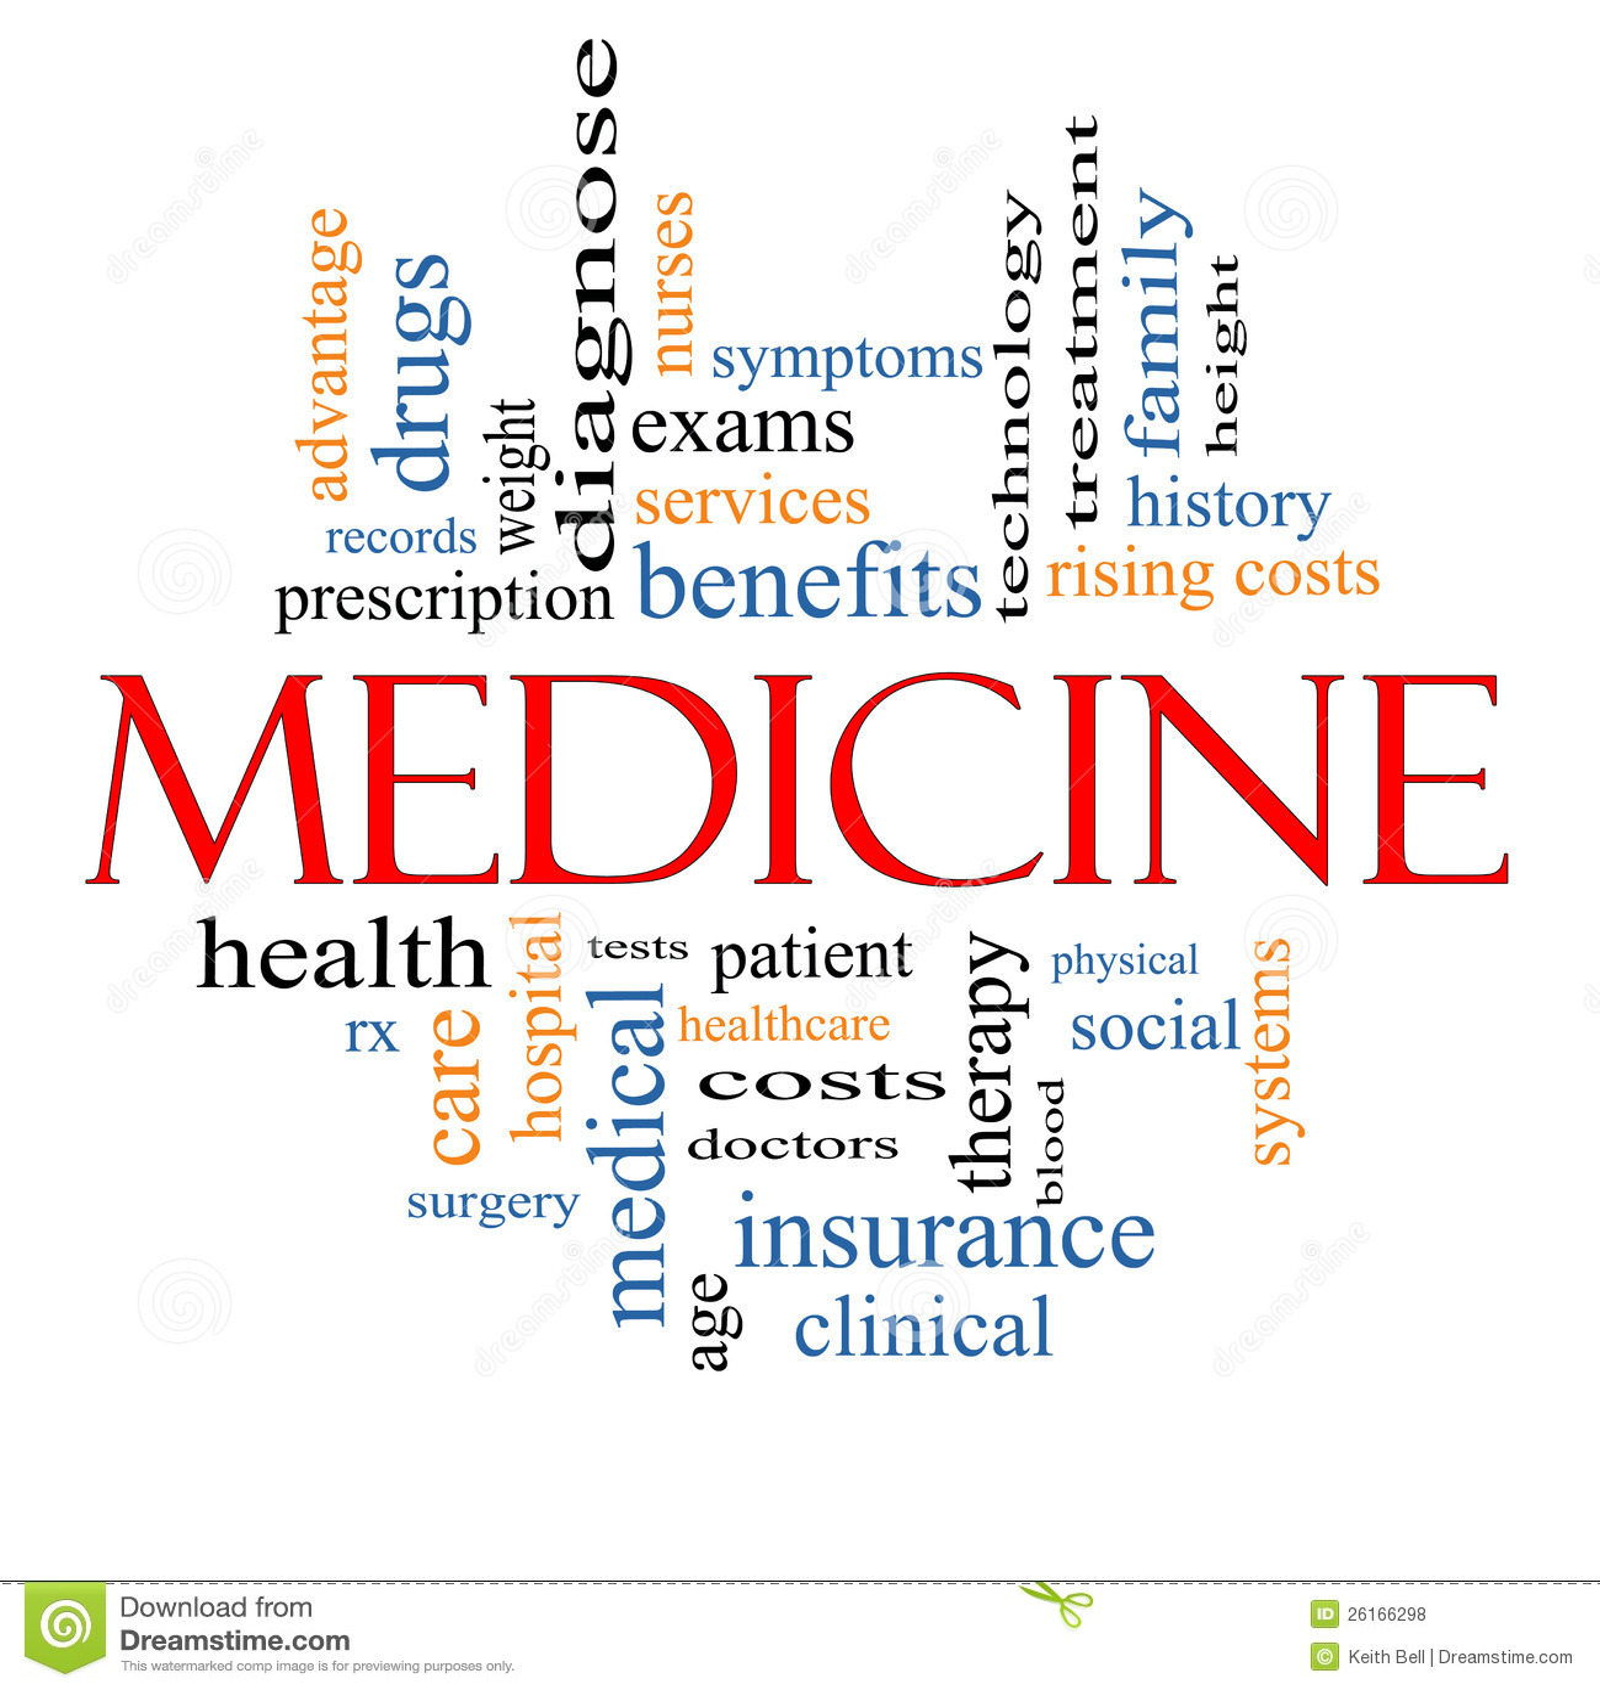 medicine word cloud concept stock illustration